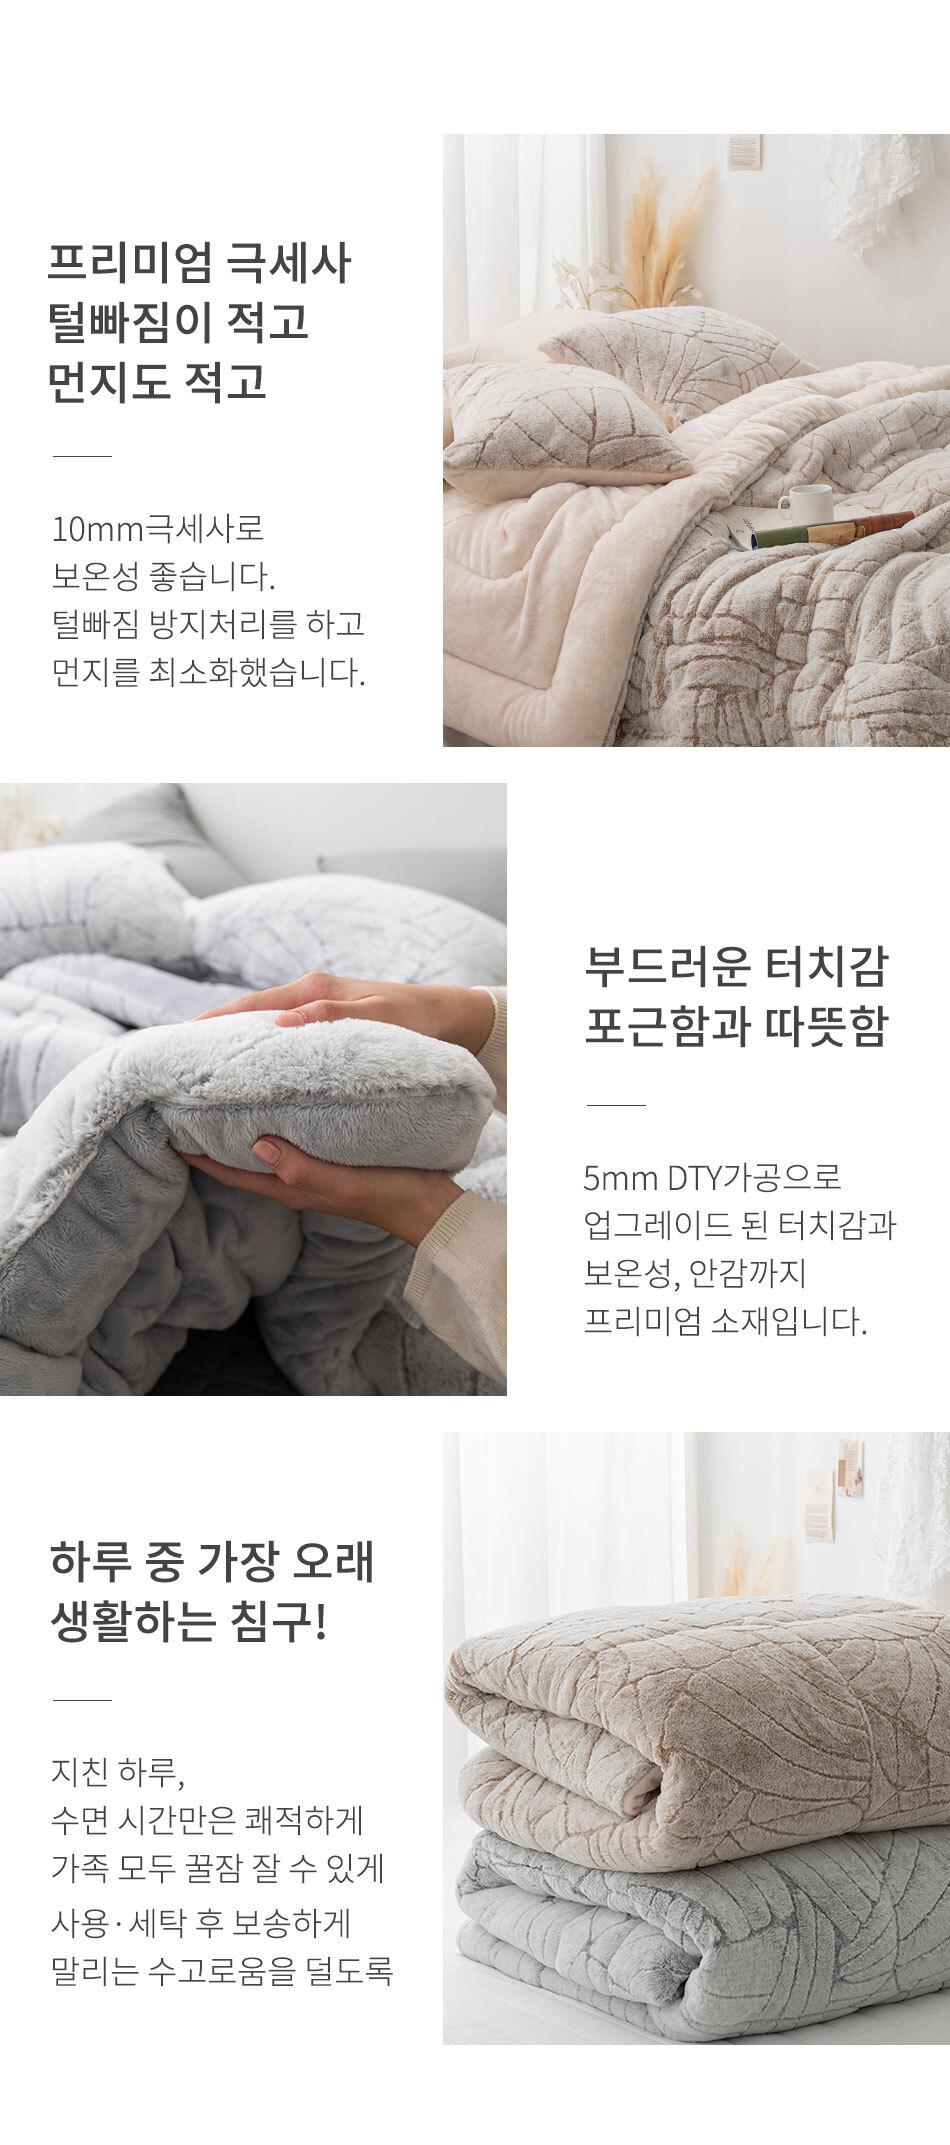 maple_bed_08.jpg